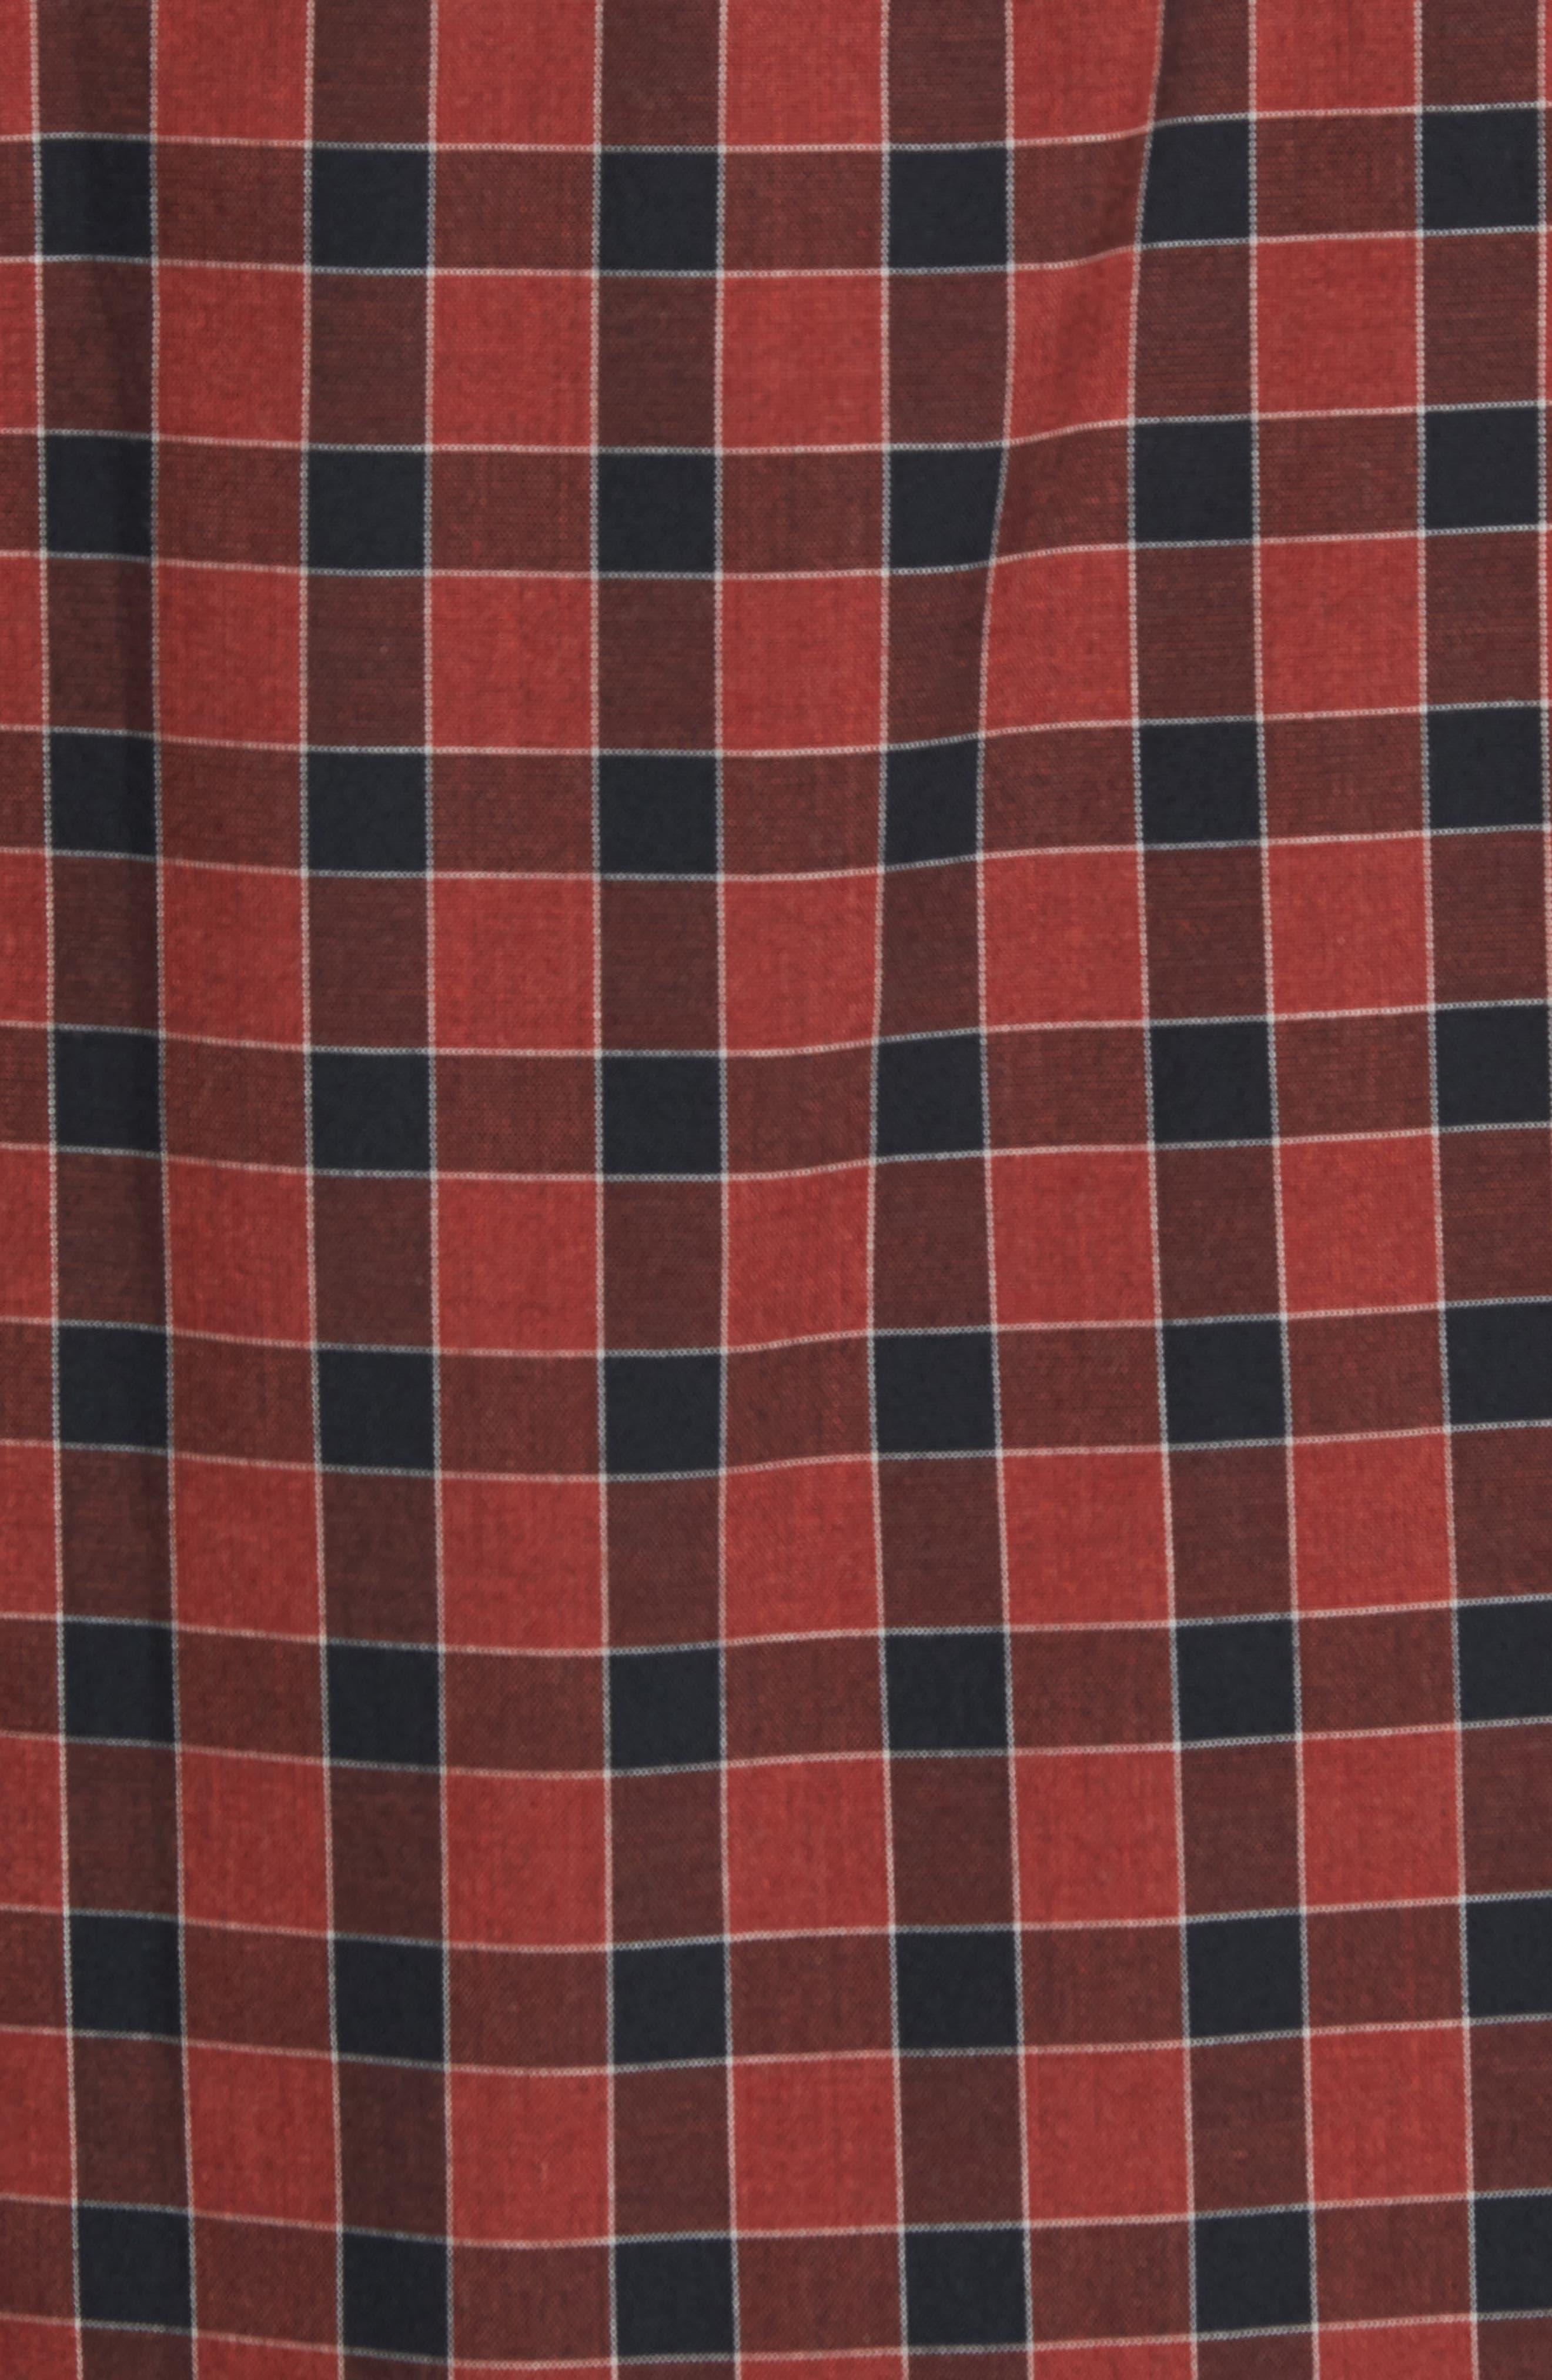 Lake Plaid Flannel Shirt,                             Alternate thumbnail 5, color,                             Red